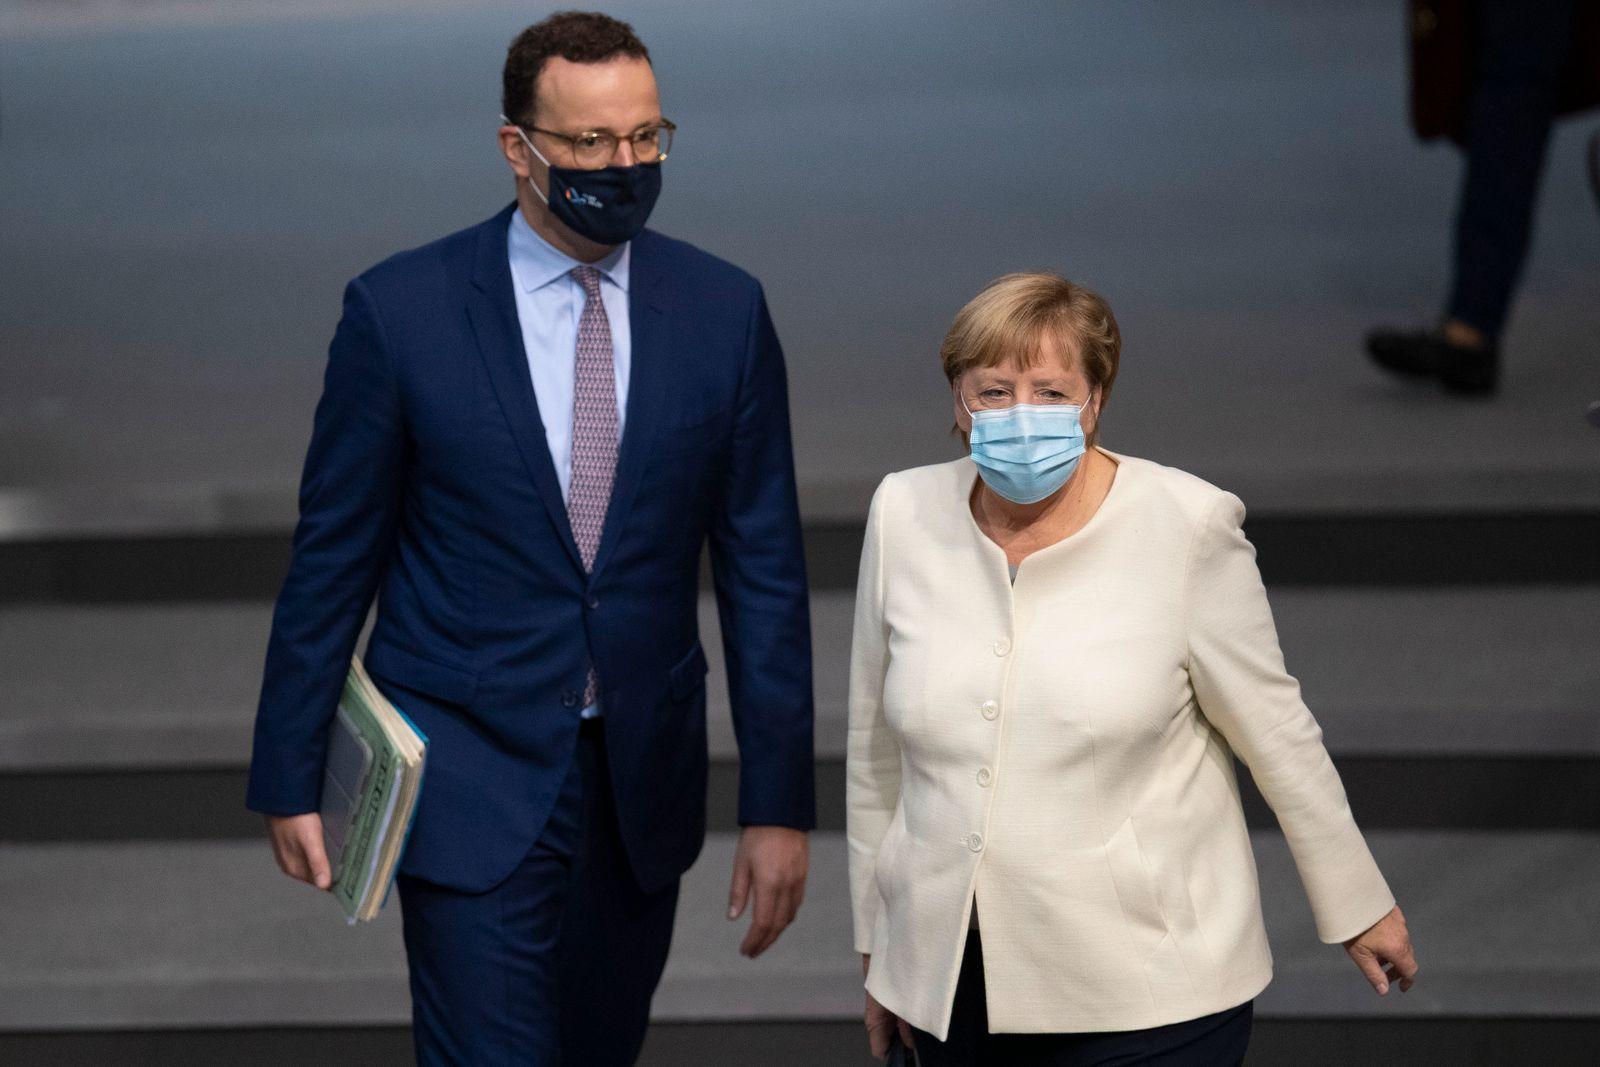 Bundestag Begins 2021 Federal Budget Debates During The Coronavirus Pandemic